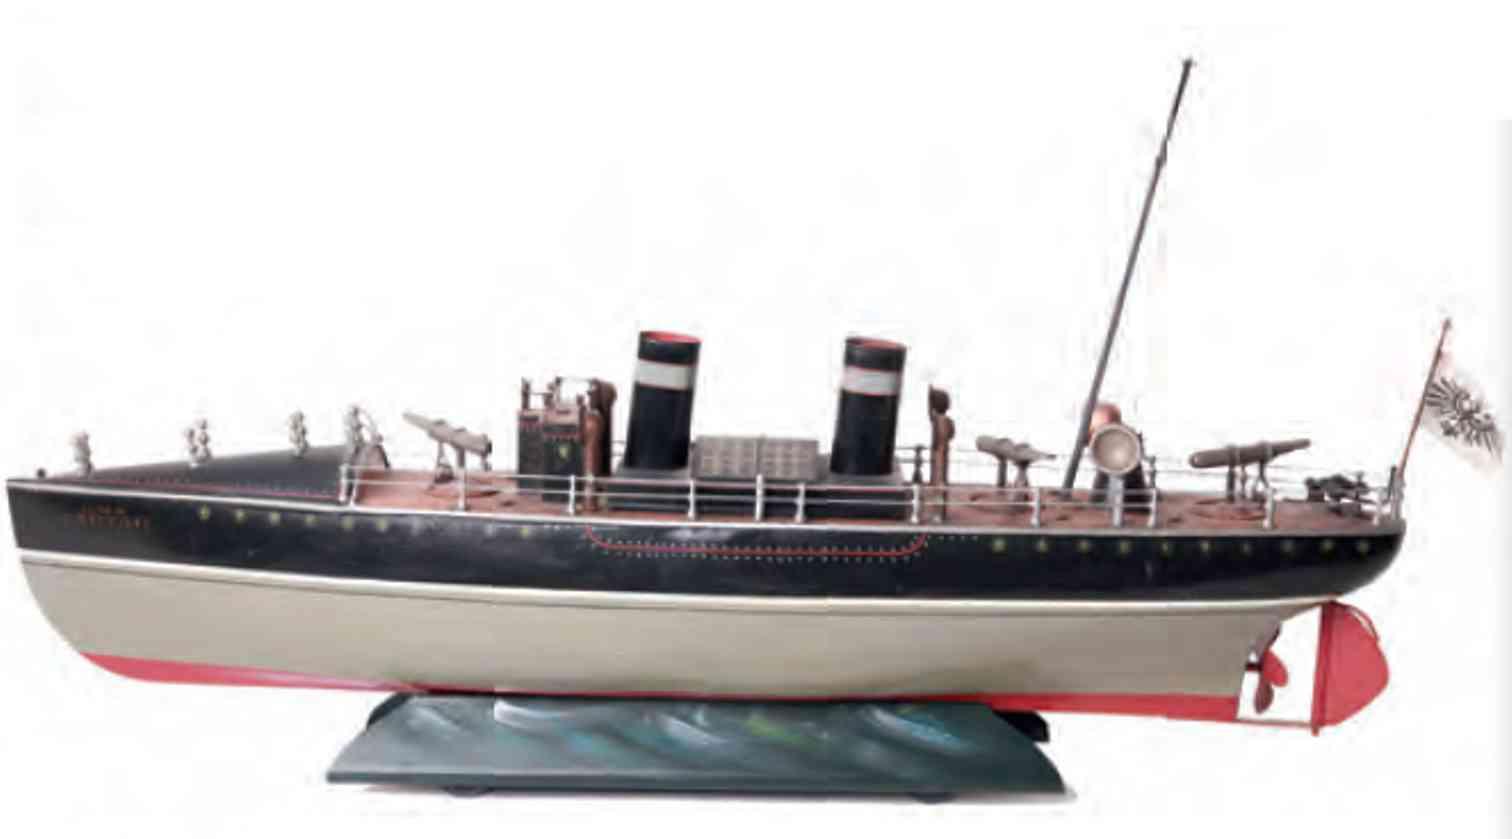 marklin maerklin tin toy torpedo boat with clockwork